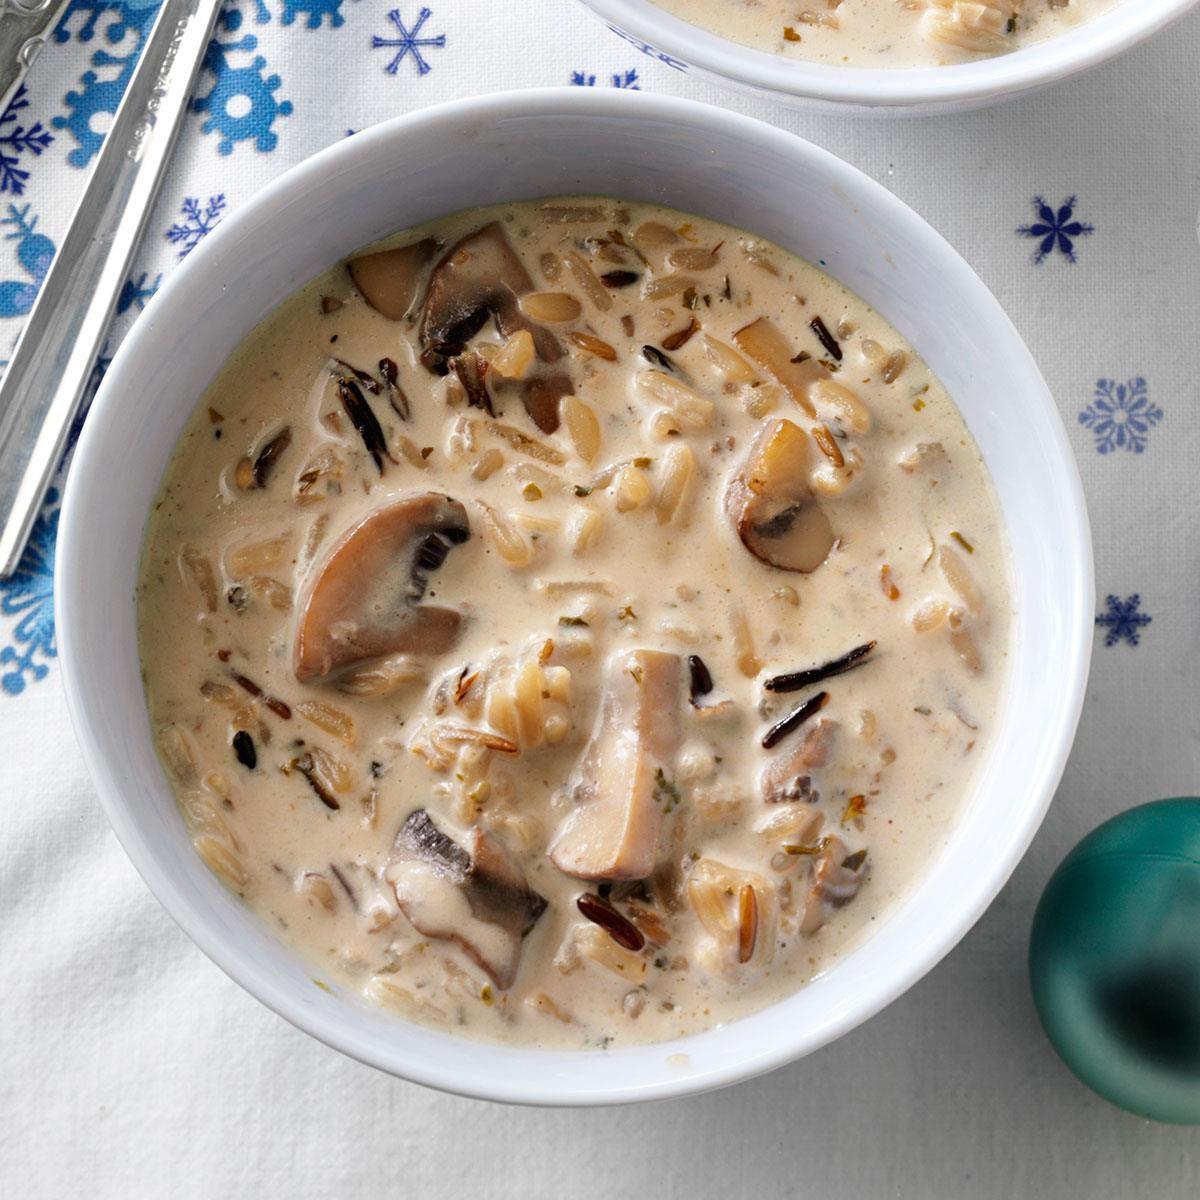 Kentucky: Wild Rice and Mushroom Soup